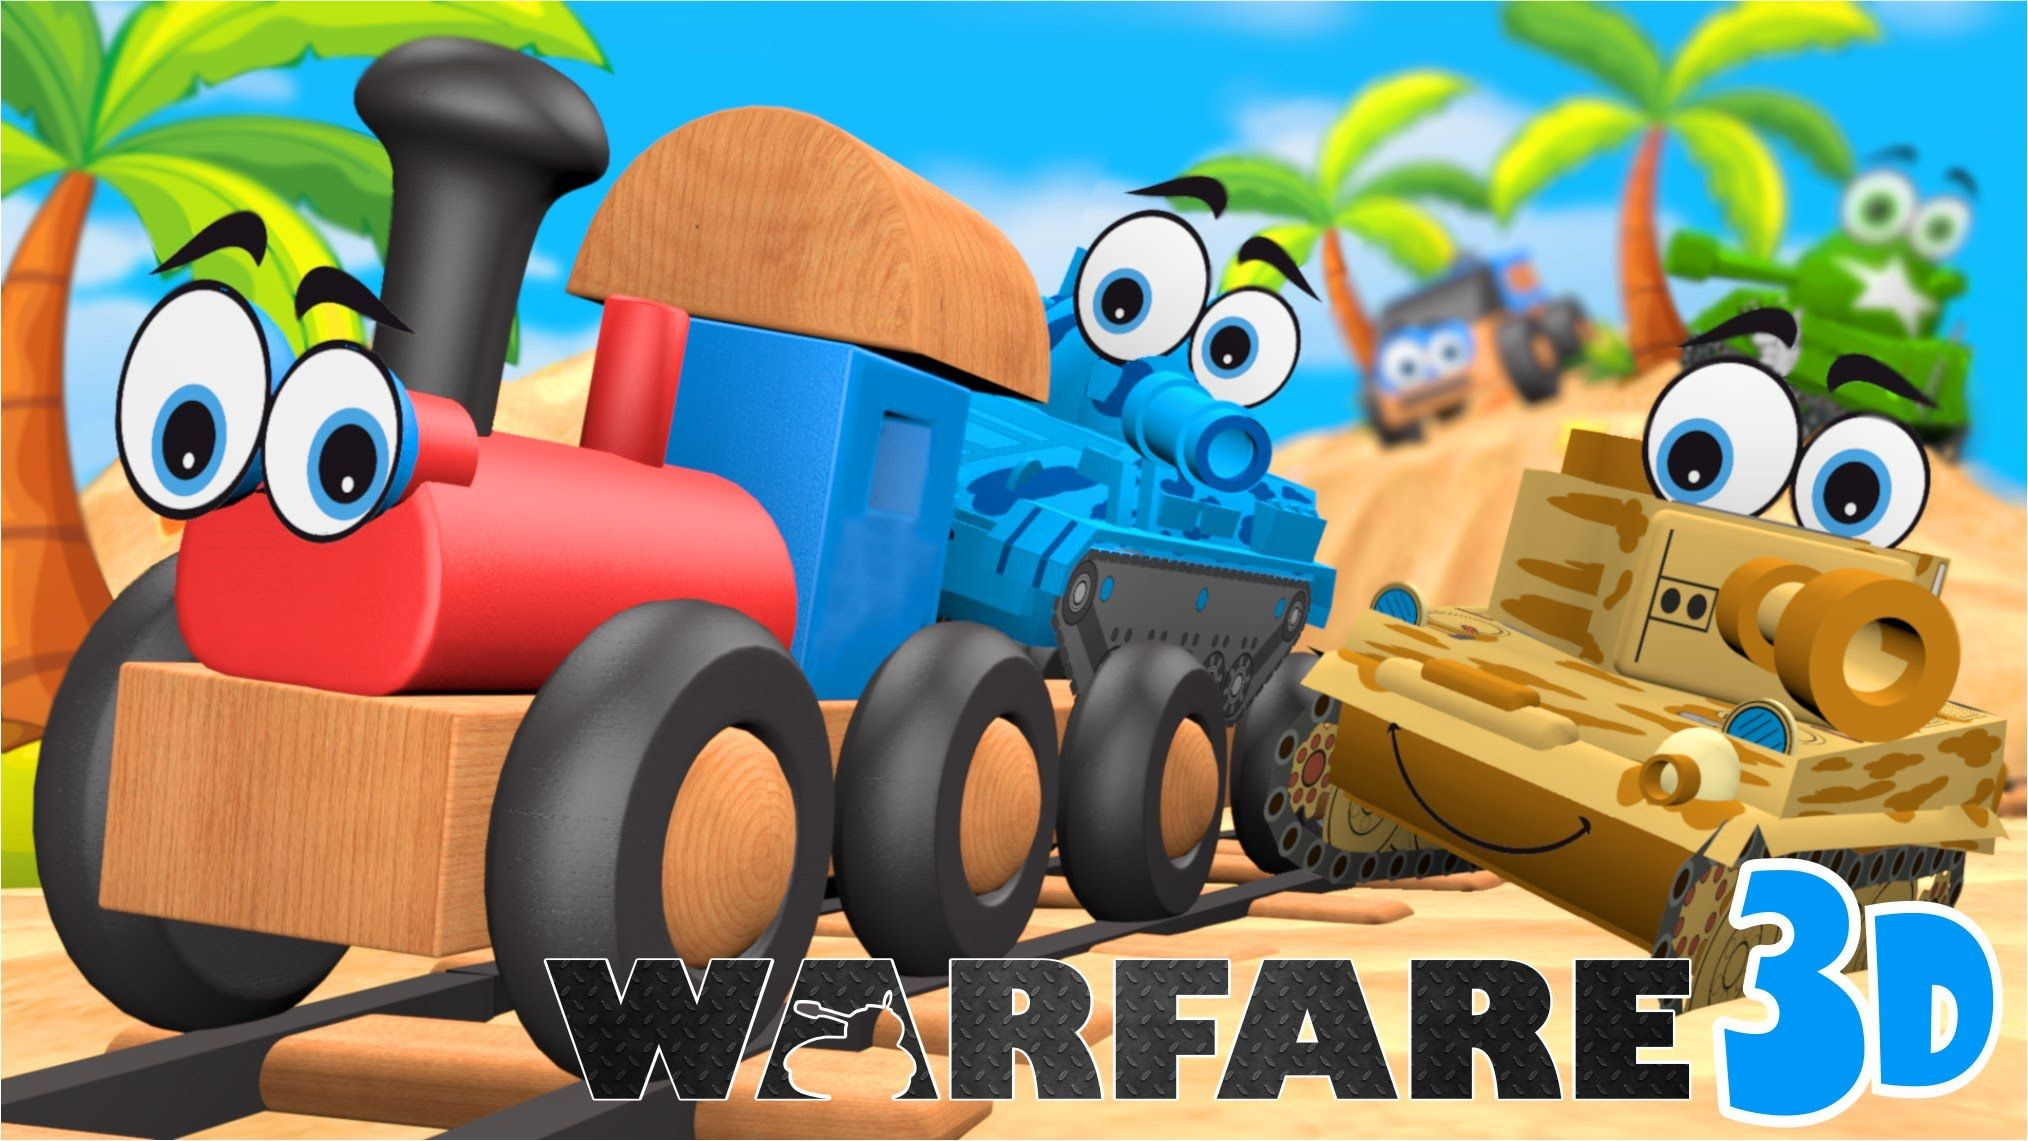 Uncategorized Cartoons Video cartoons warfare 3d tropical vacation cartoon about cars vs tanks